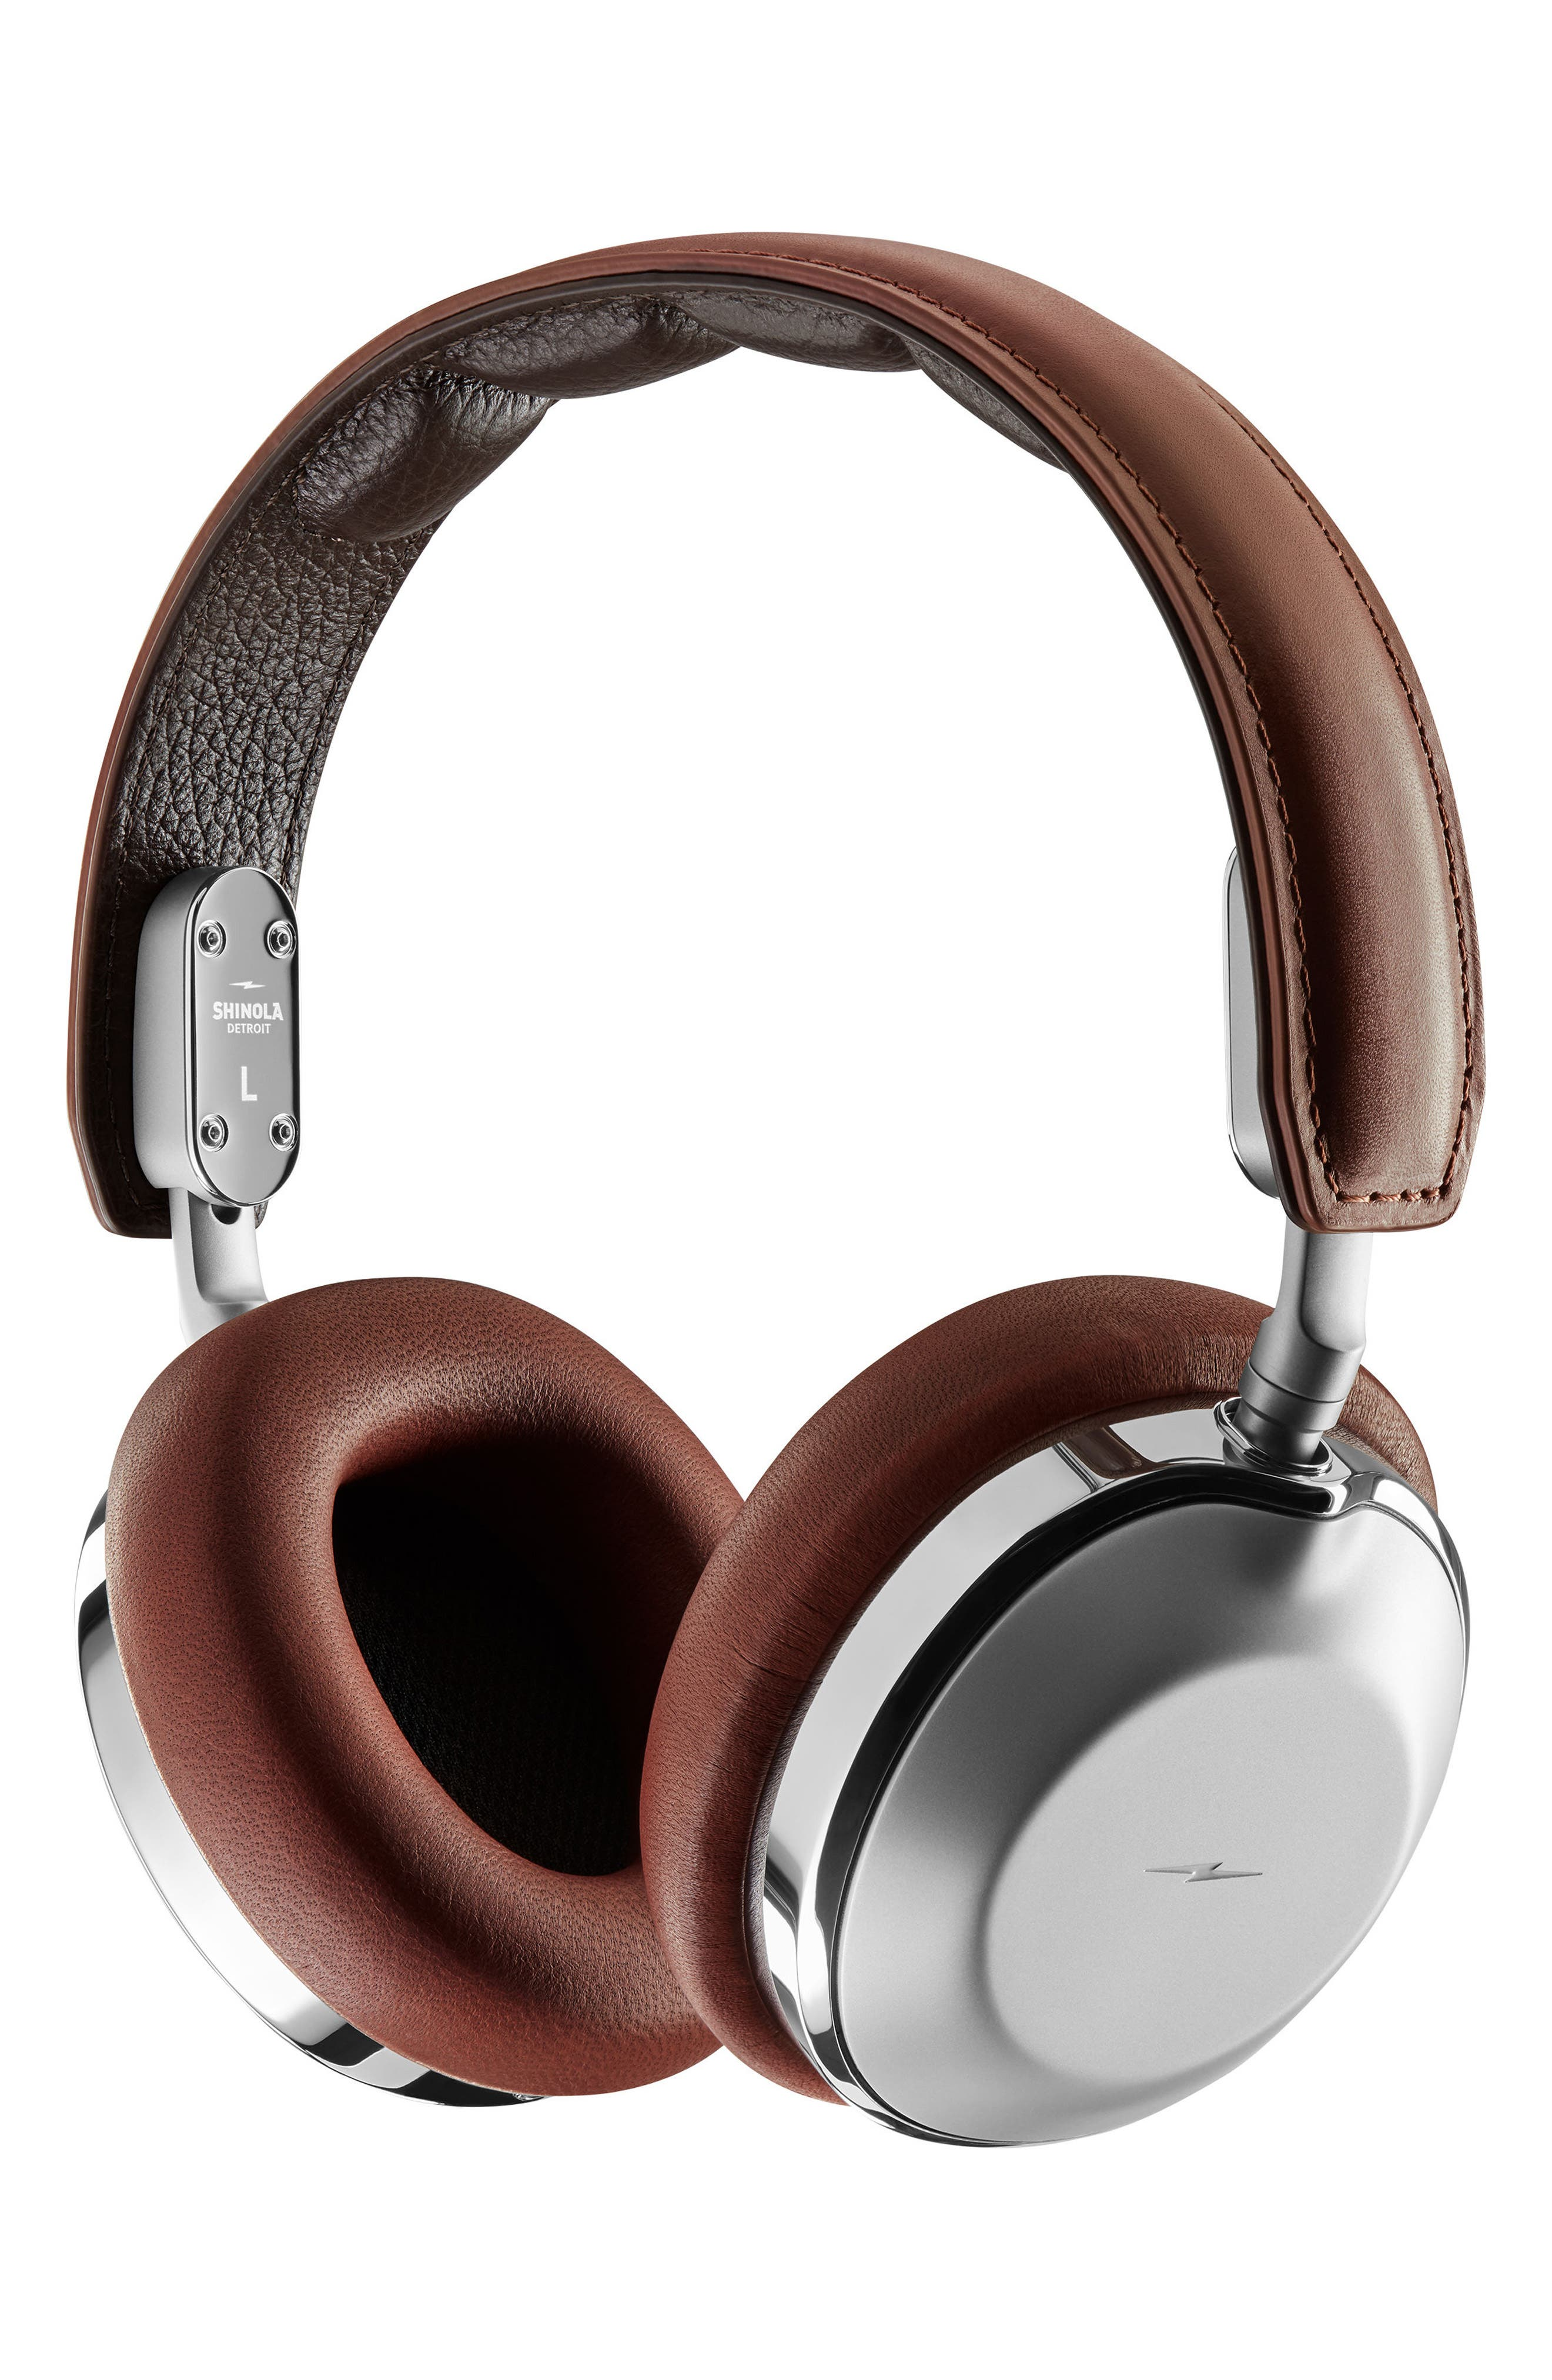 Alternate Image 1 Selected - Shinola Canfield Over-Ear Headphones